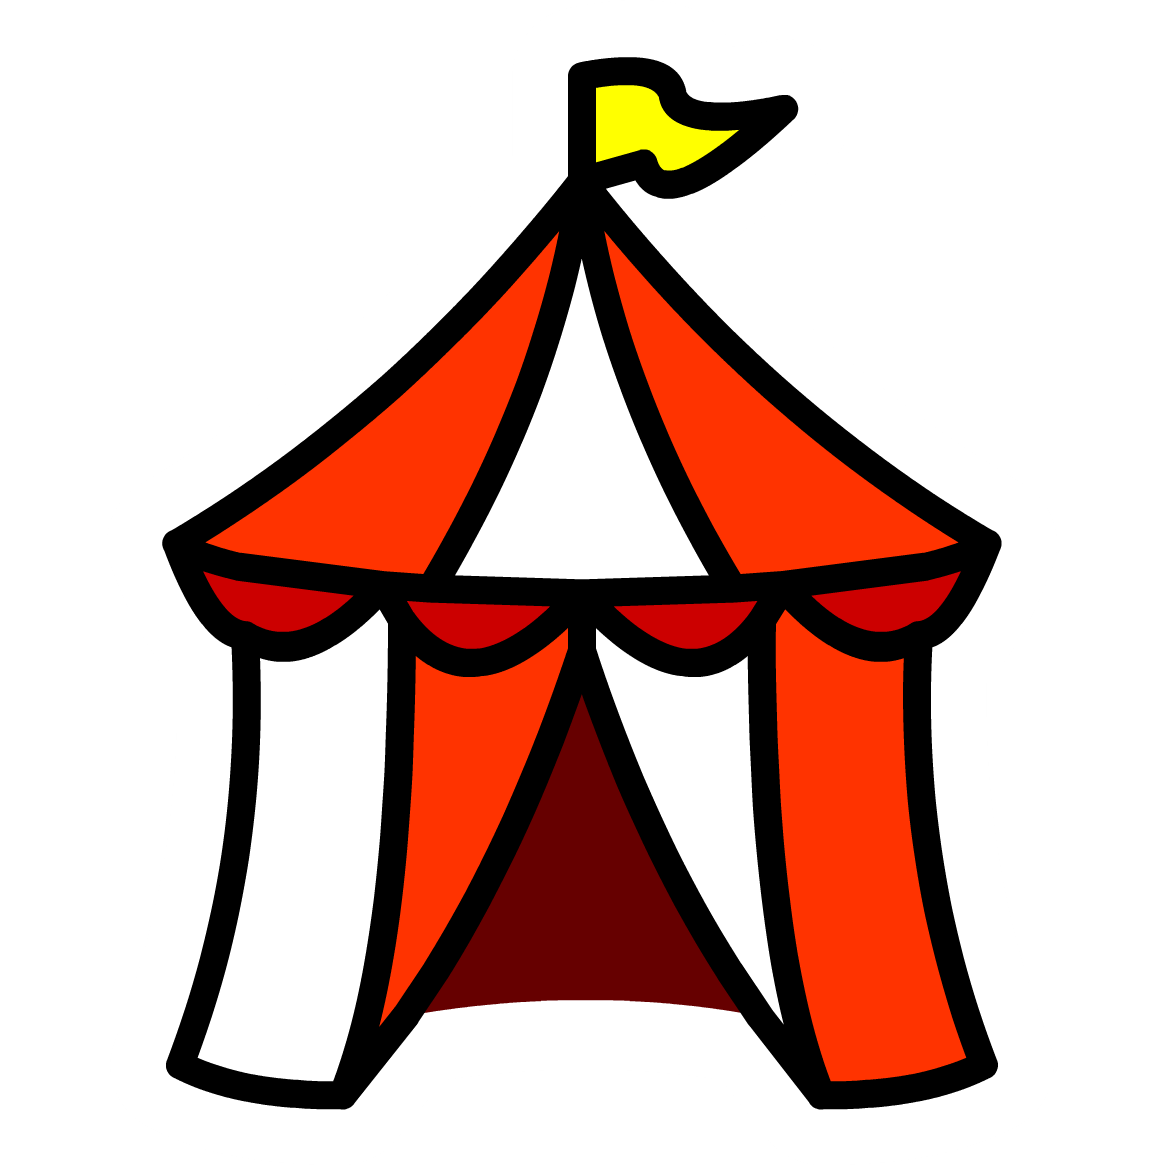 Carnival Tent Clip Art.